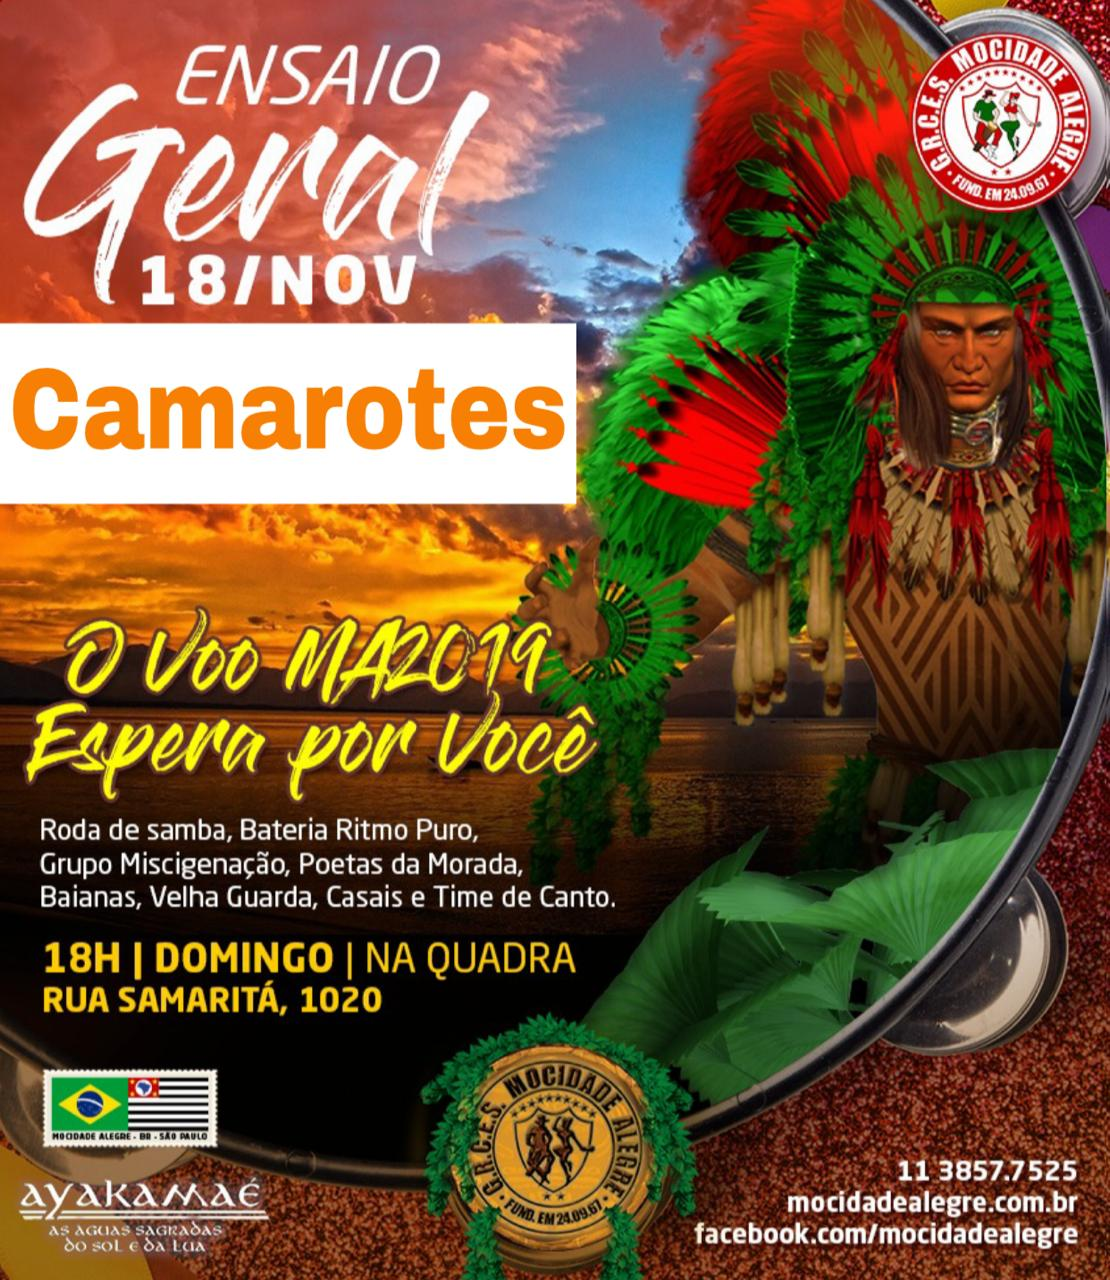 CAMAROTE ENSAIO GERAL 18/11  - Mocidade Alegre